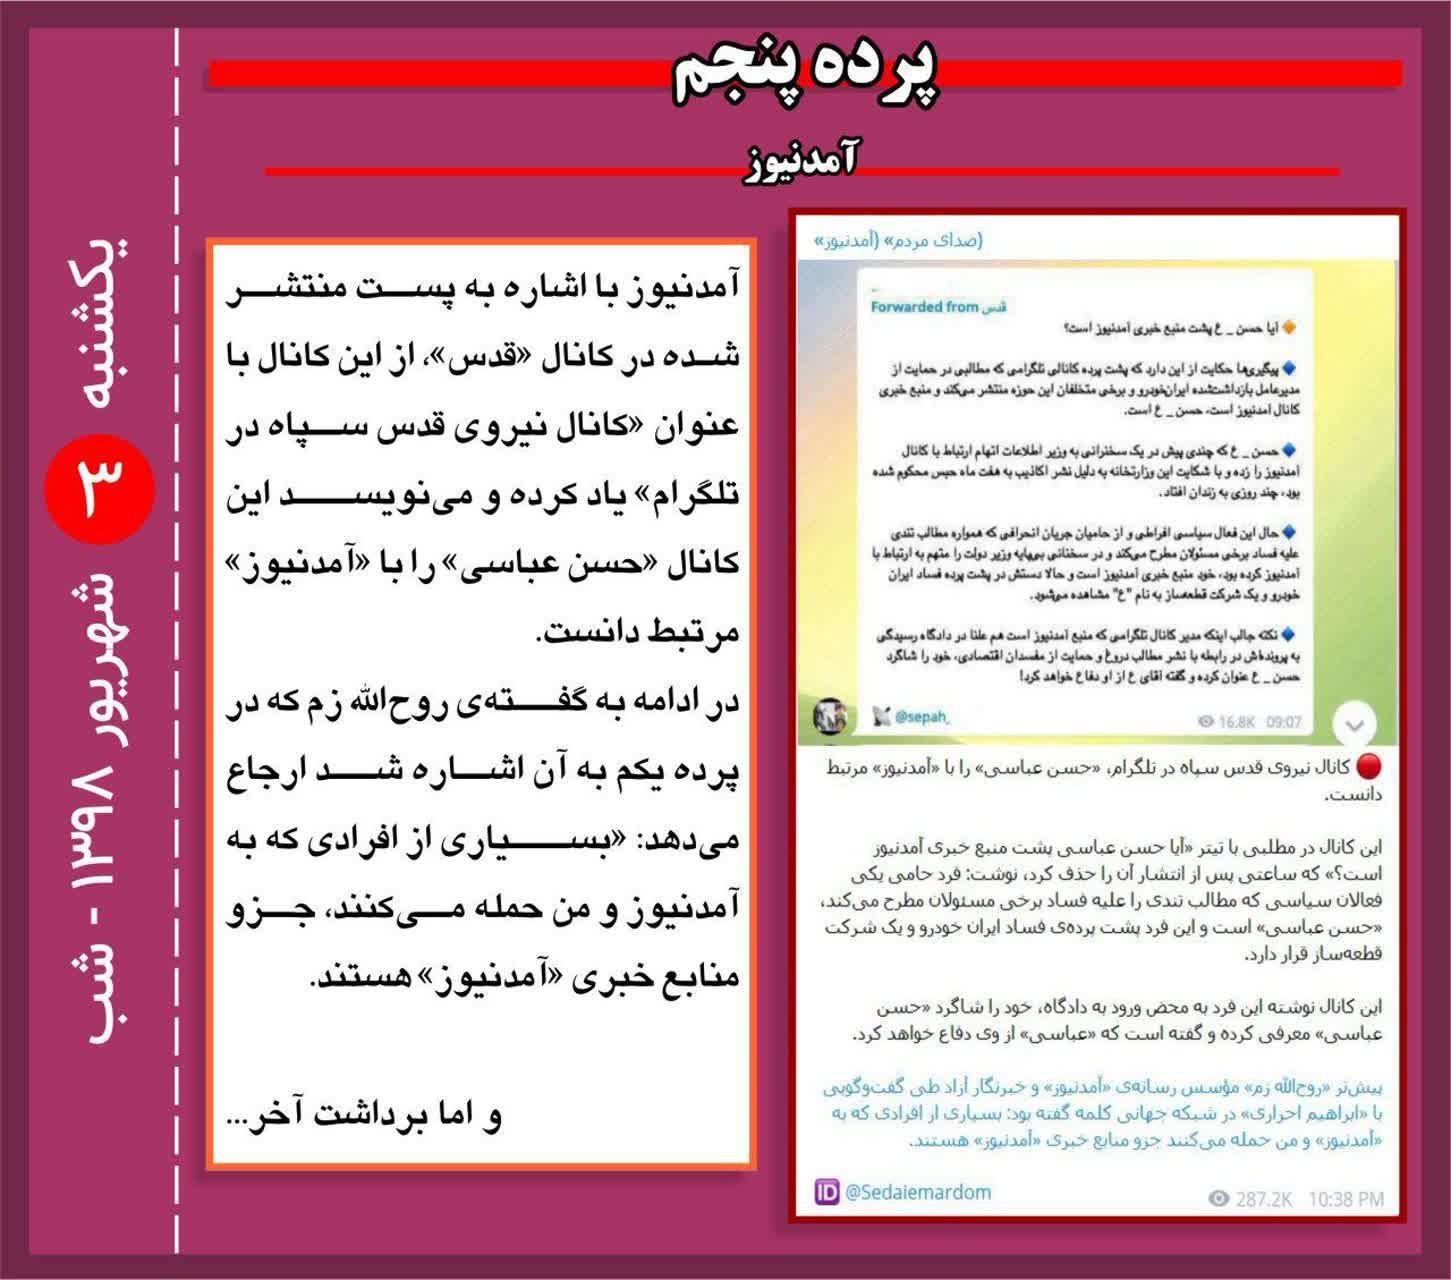 http://dl-abbasi.ir/yekta/1398/Graphic/RMT/5.jpg